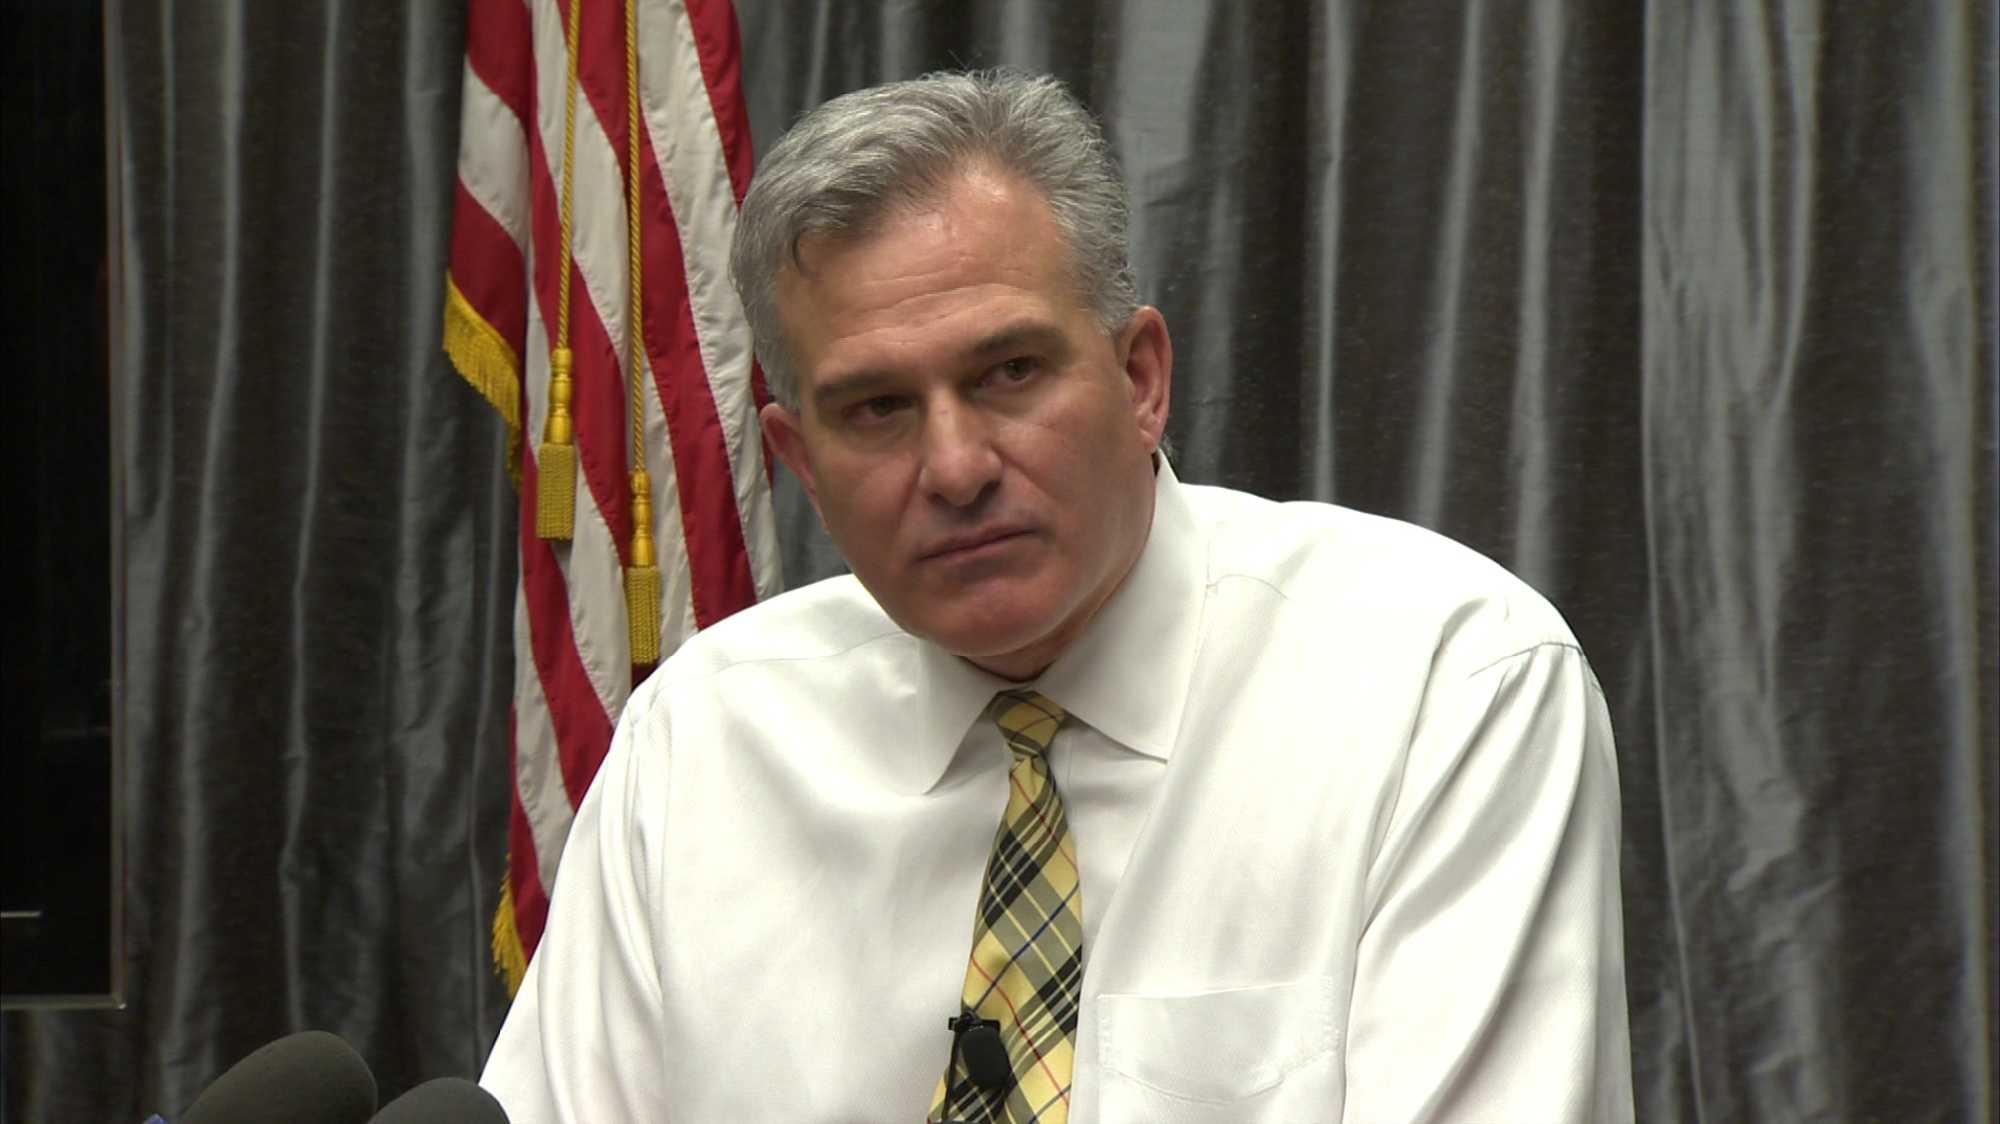 Allegheny County District AttorneyStephen Zappala